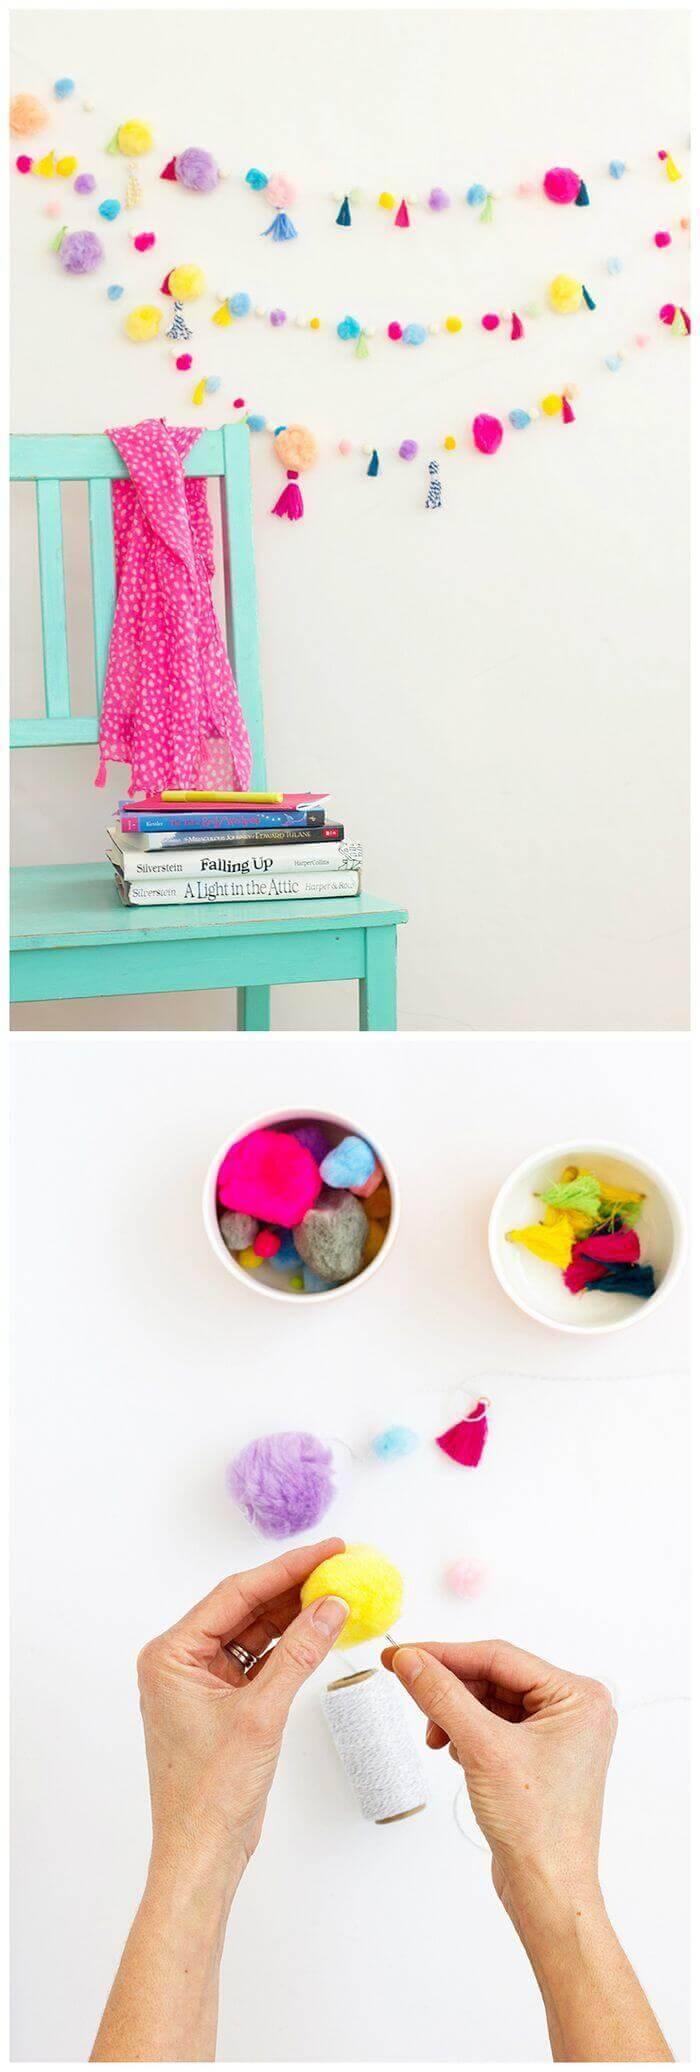 DIY Pom Pom Tassel Garland